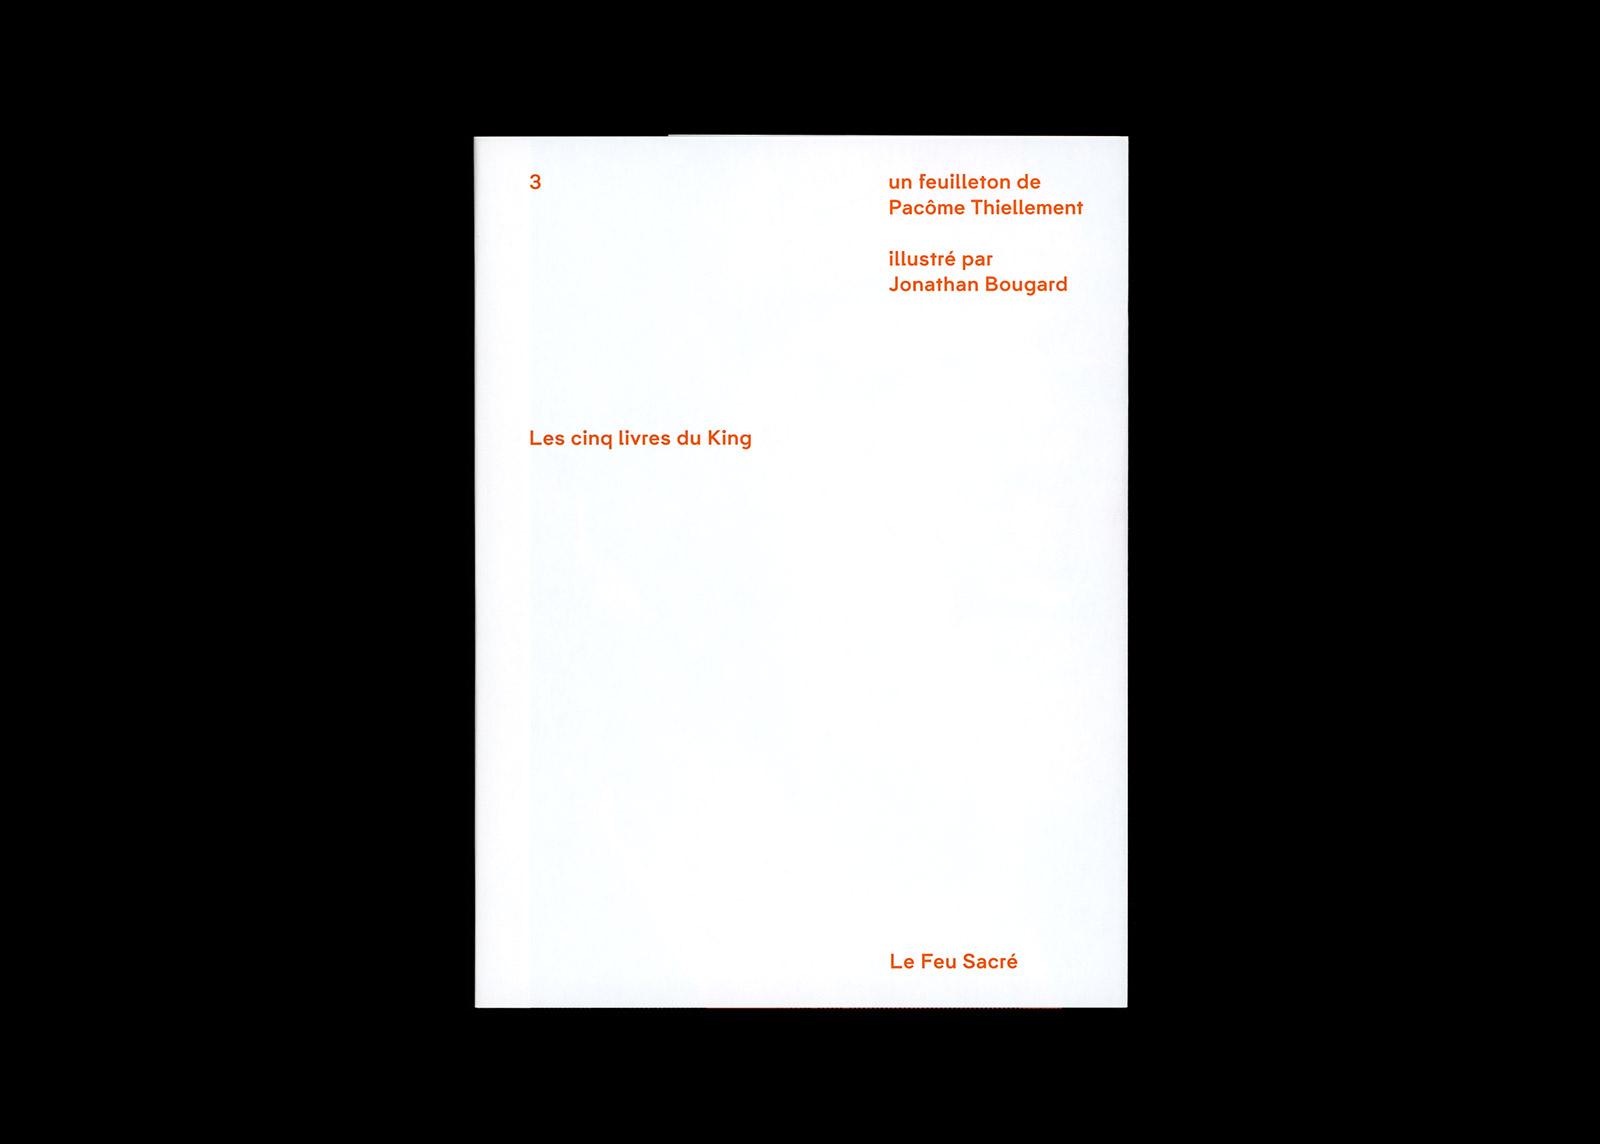 Les cinq livres du King 01